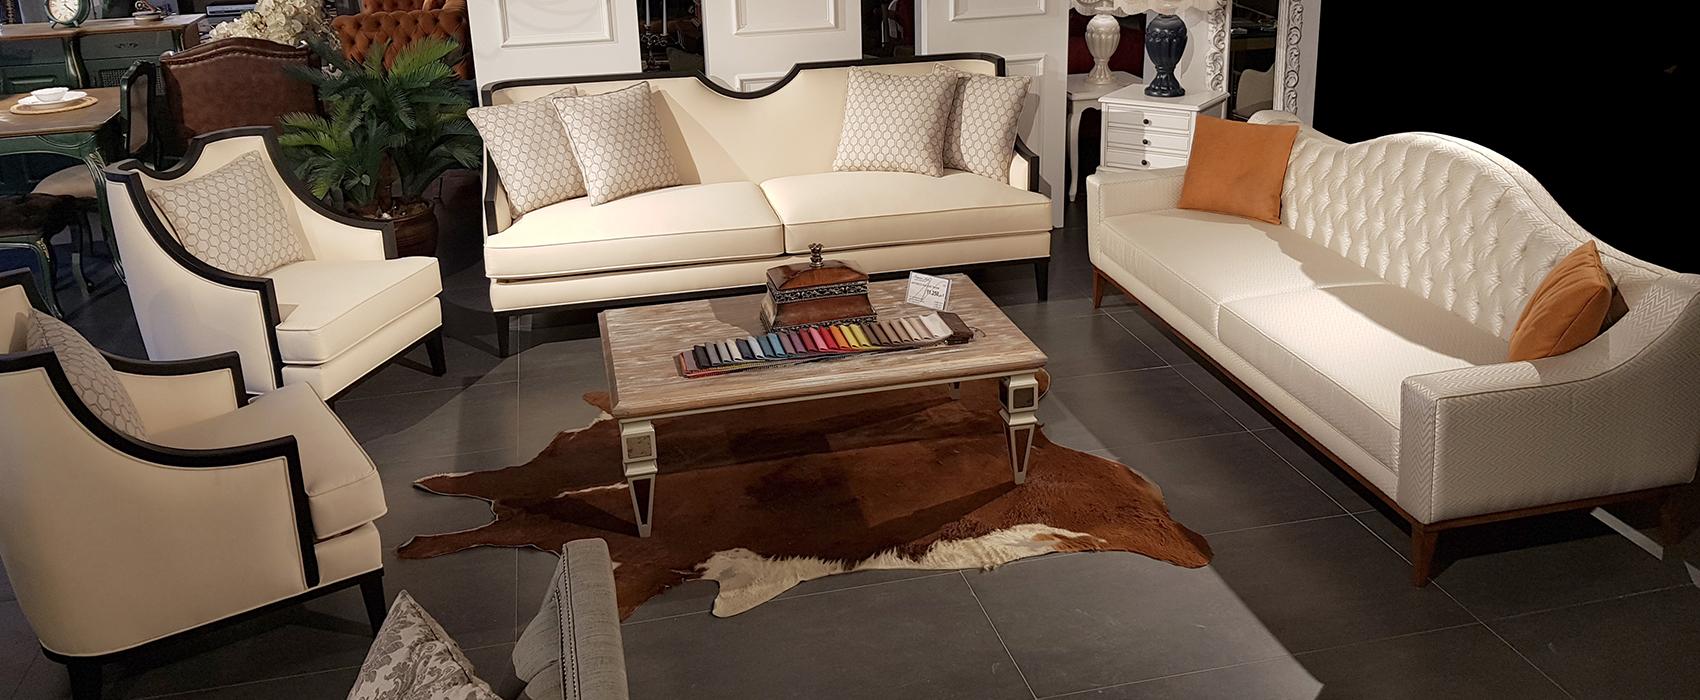 Artdeko Sofa Qatar Sofa Set Artdeco Style